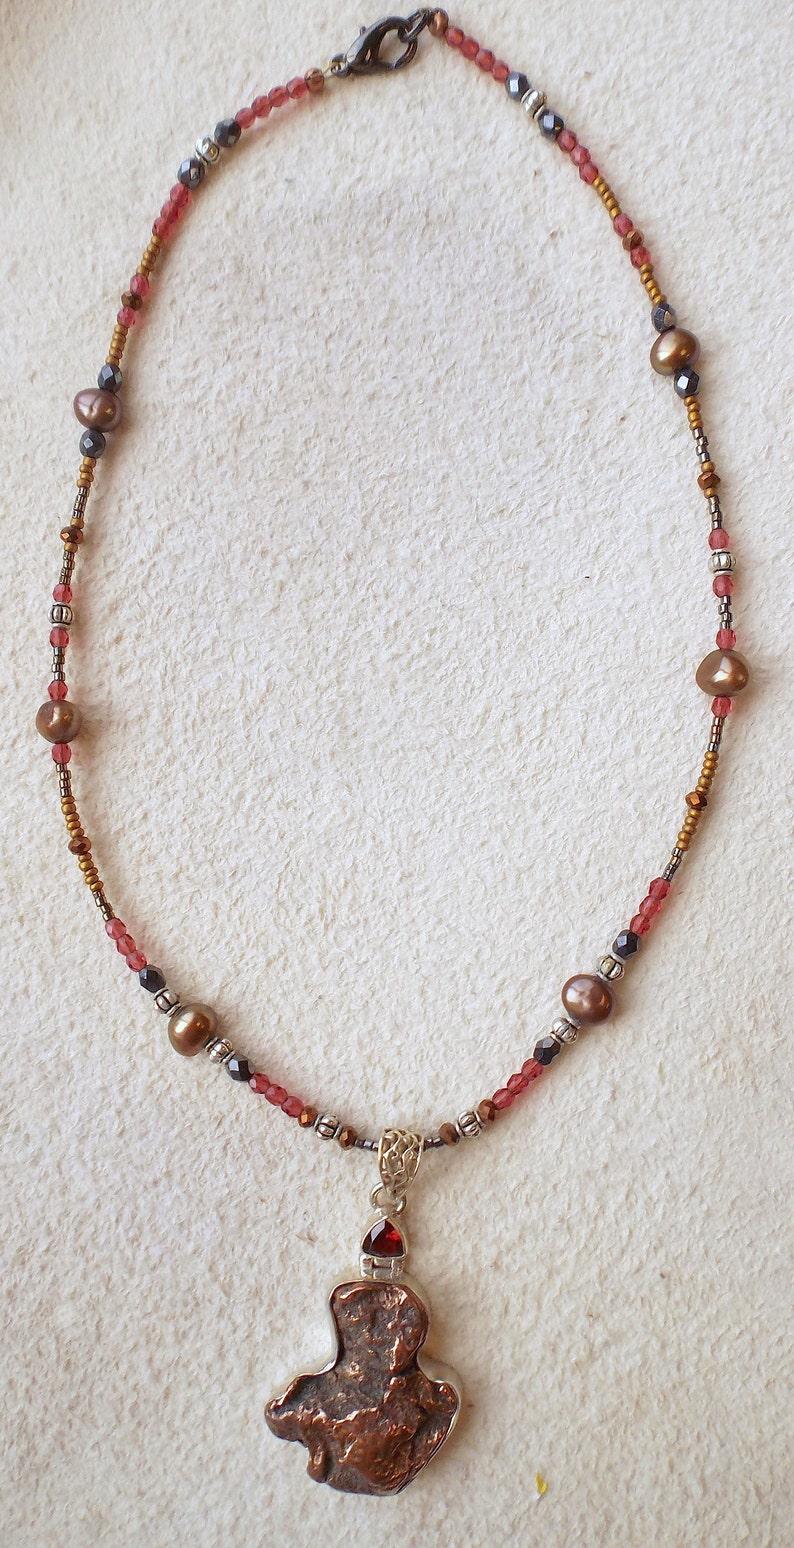 modern nouveau, raw copper jewelry beaded copper necklace copper pendant necklace